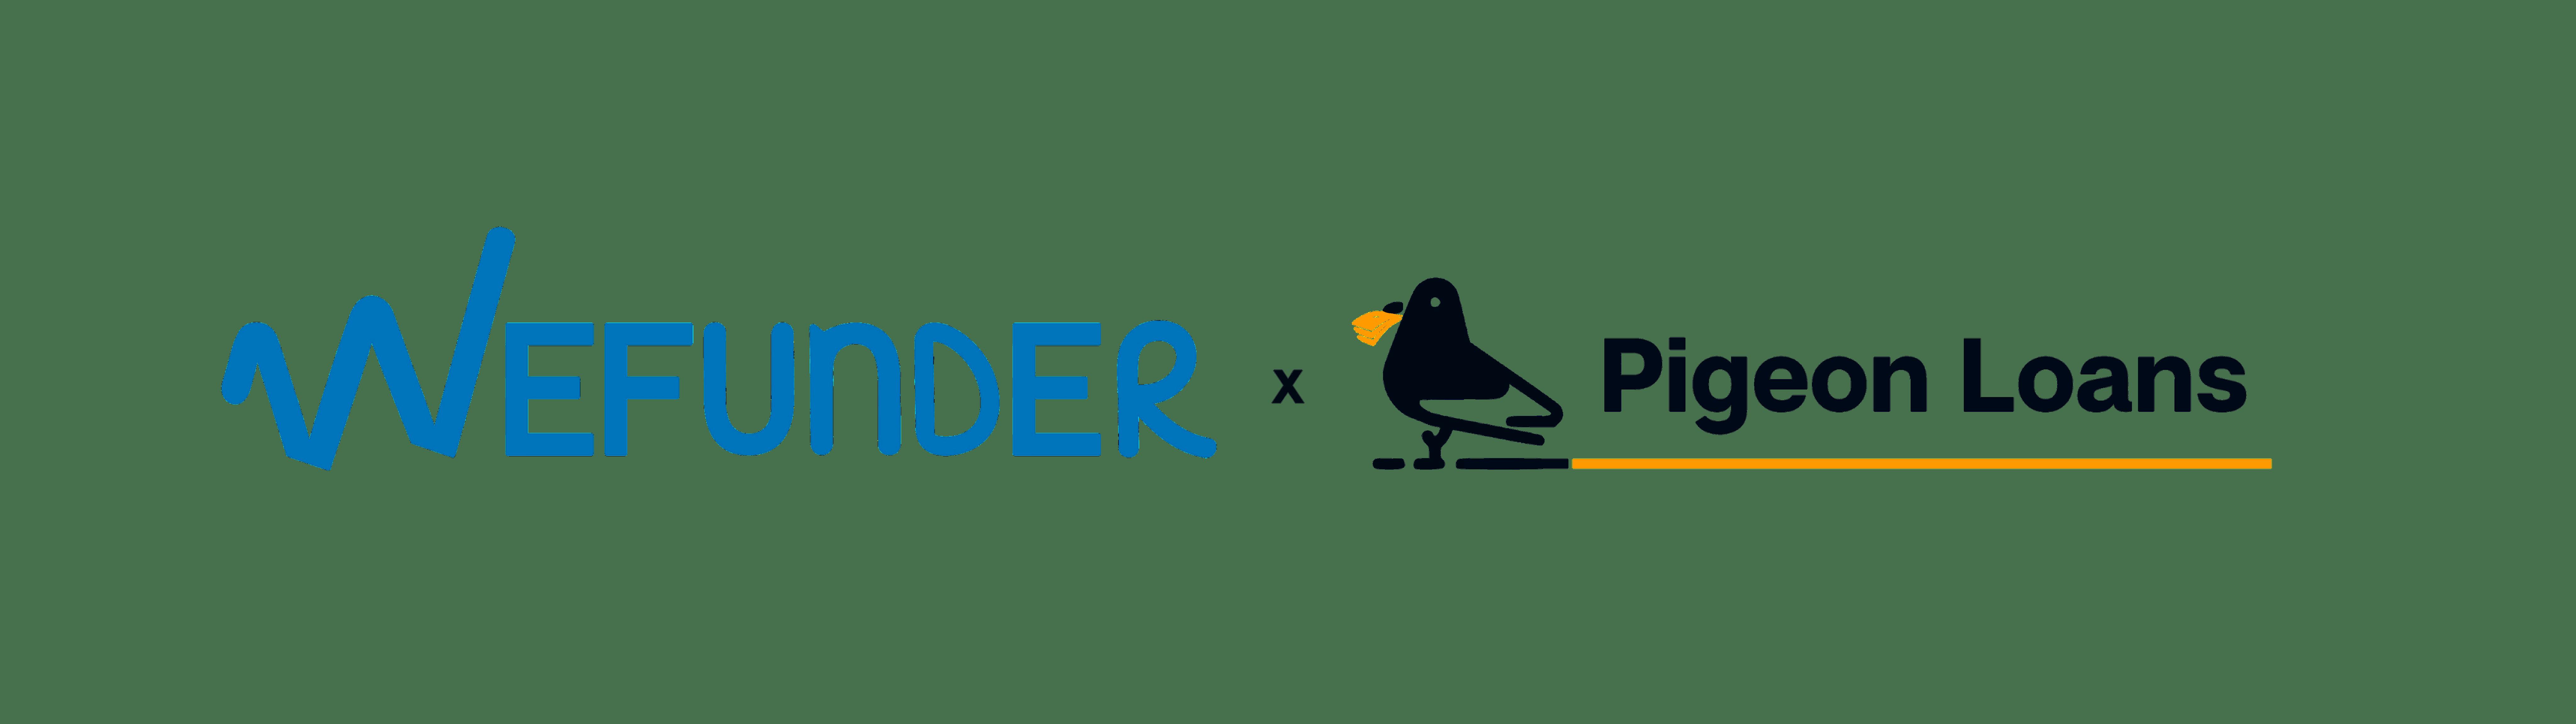 Wefunder x Pigeon Loans Logo